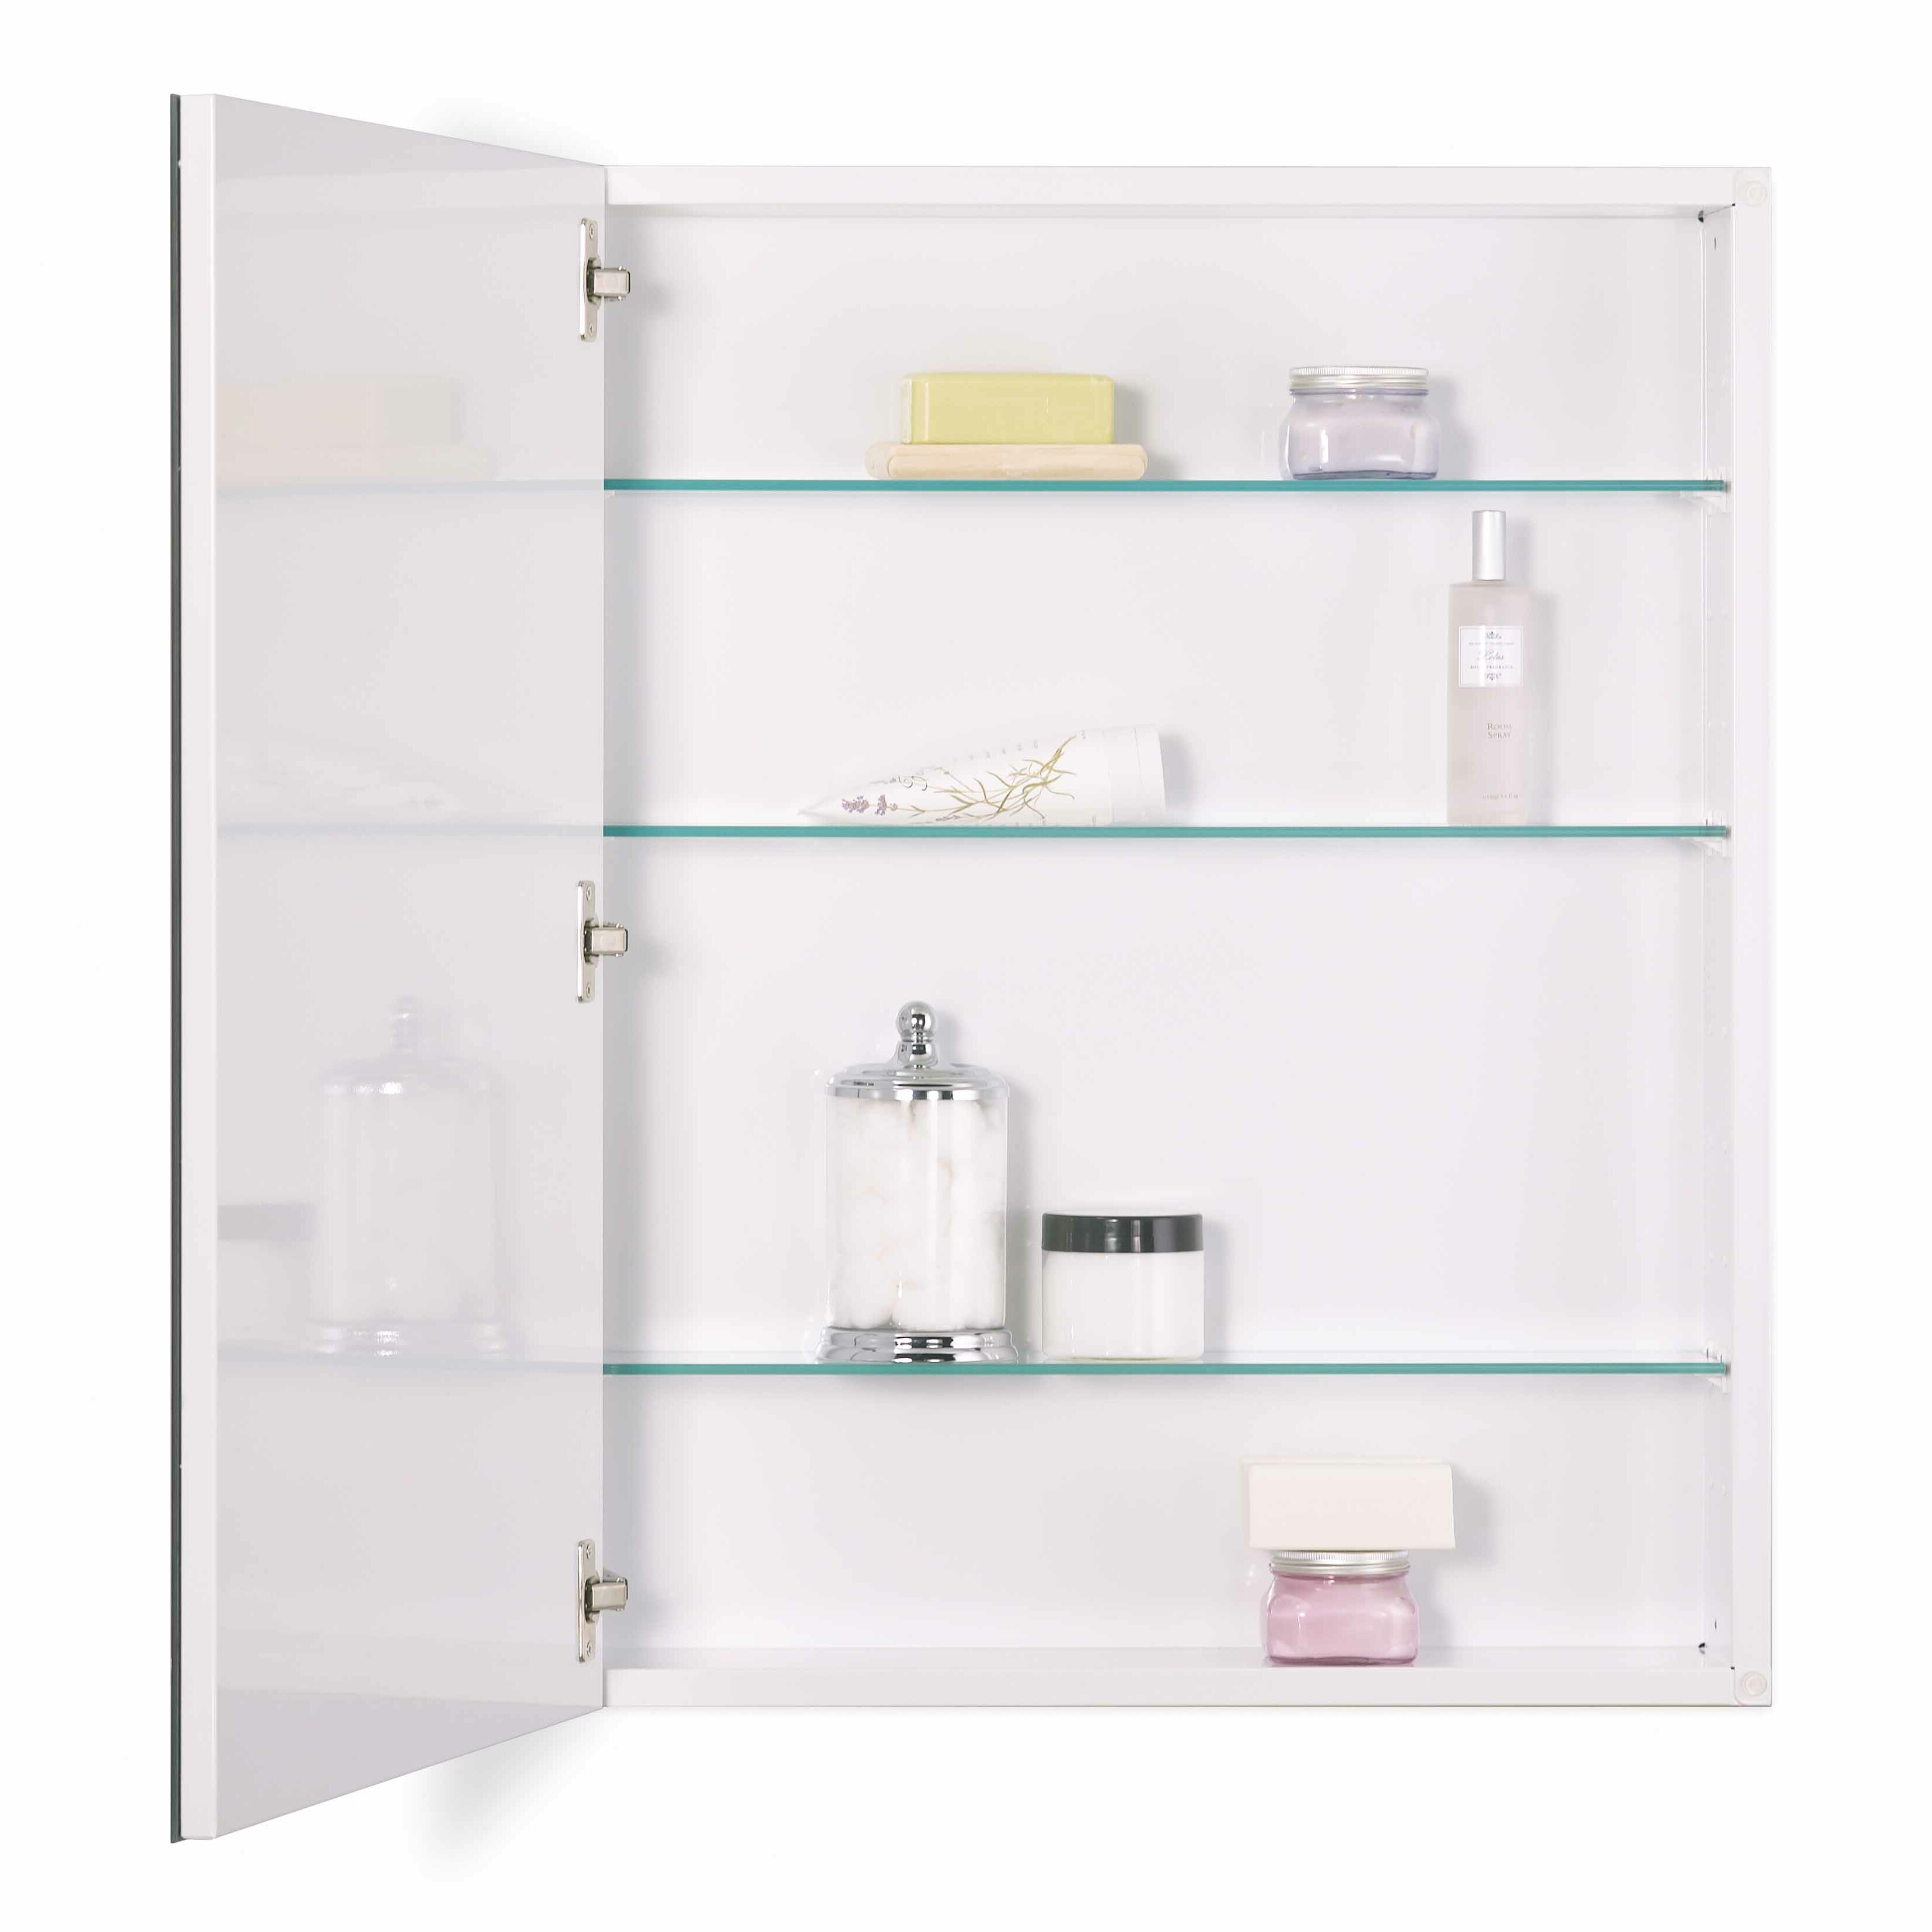 Horizontal Medicine Cabinet Jensen Metro 24 X 30 Recessed Or Surface Mount Medicine Cabinet